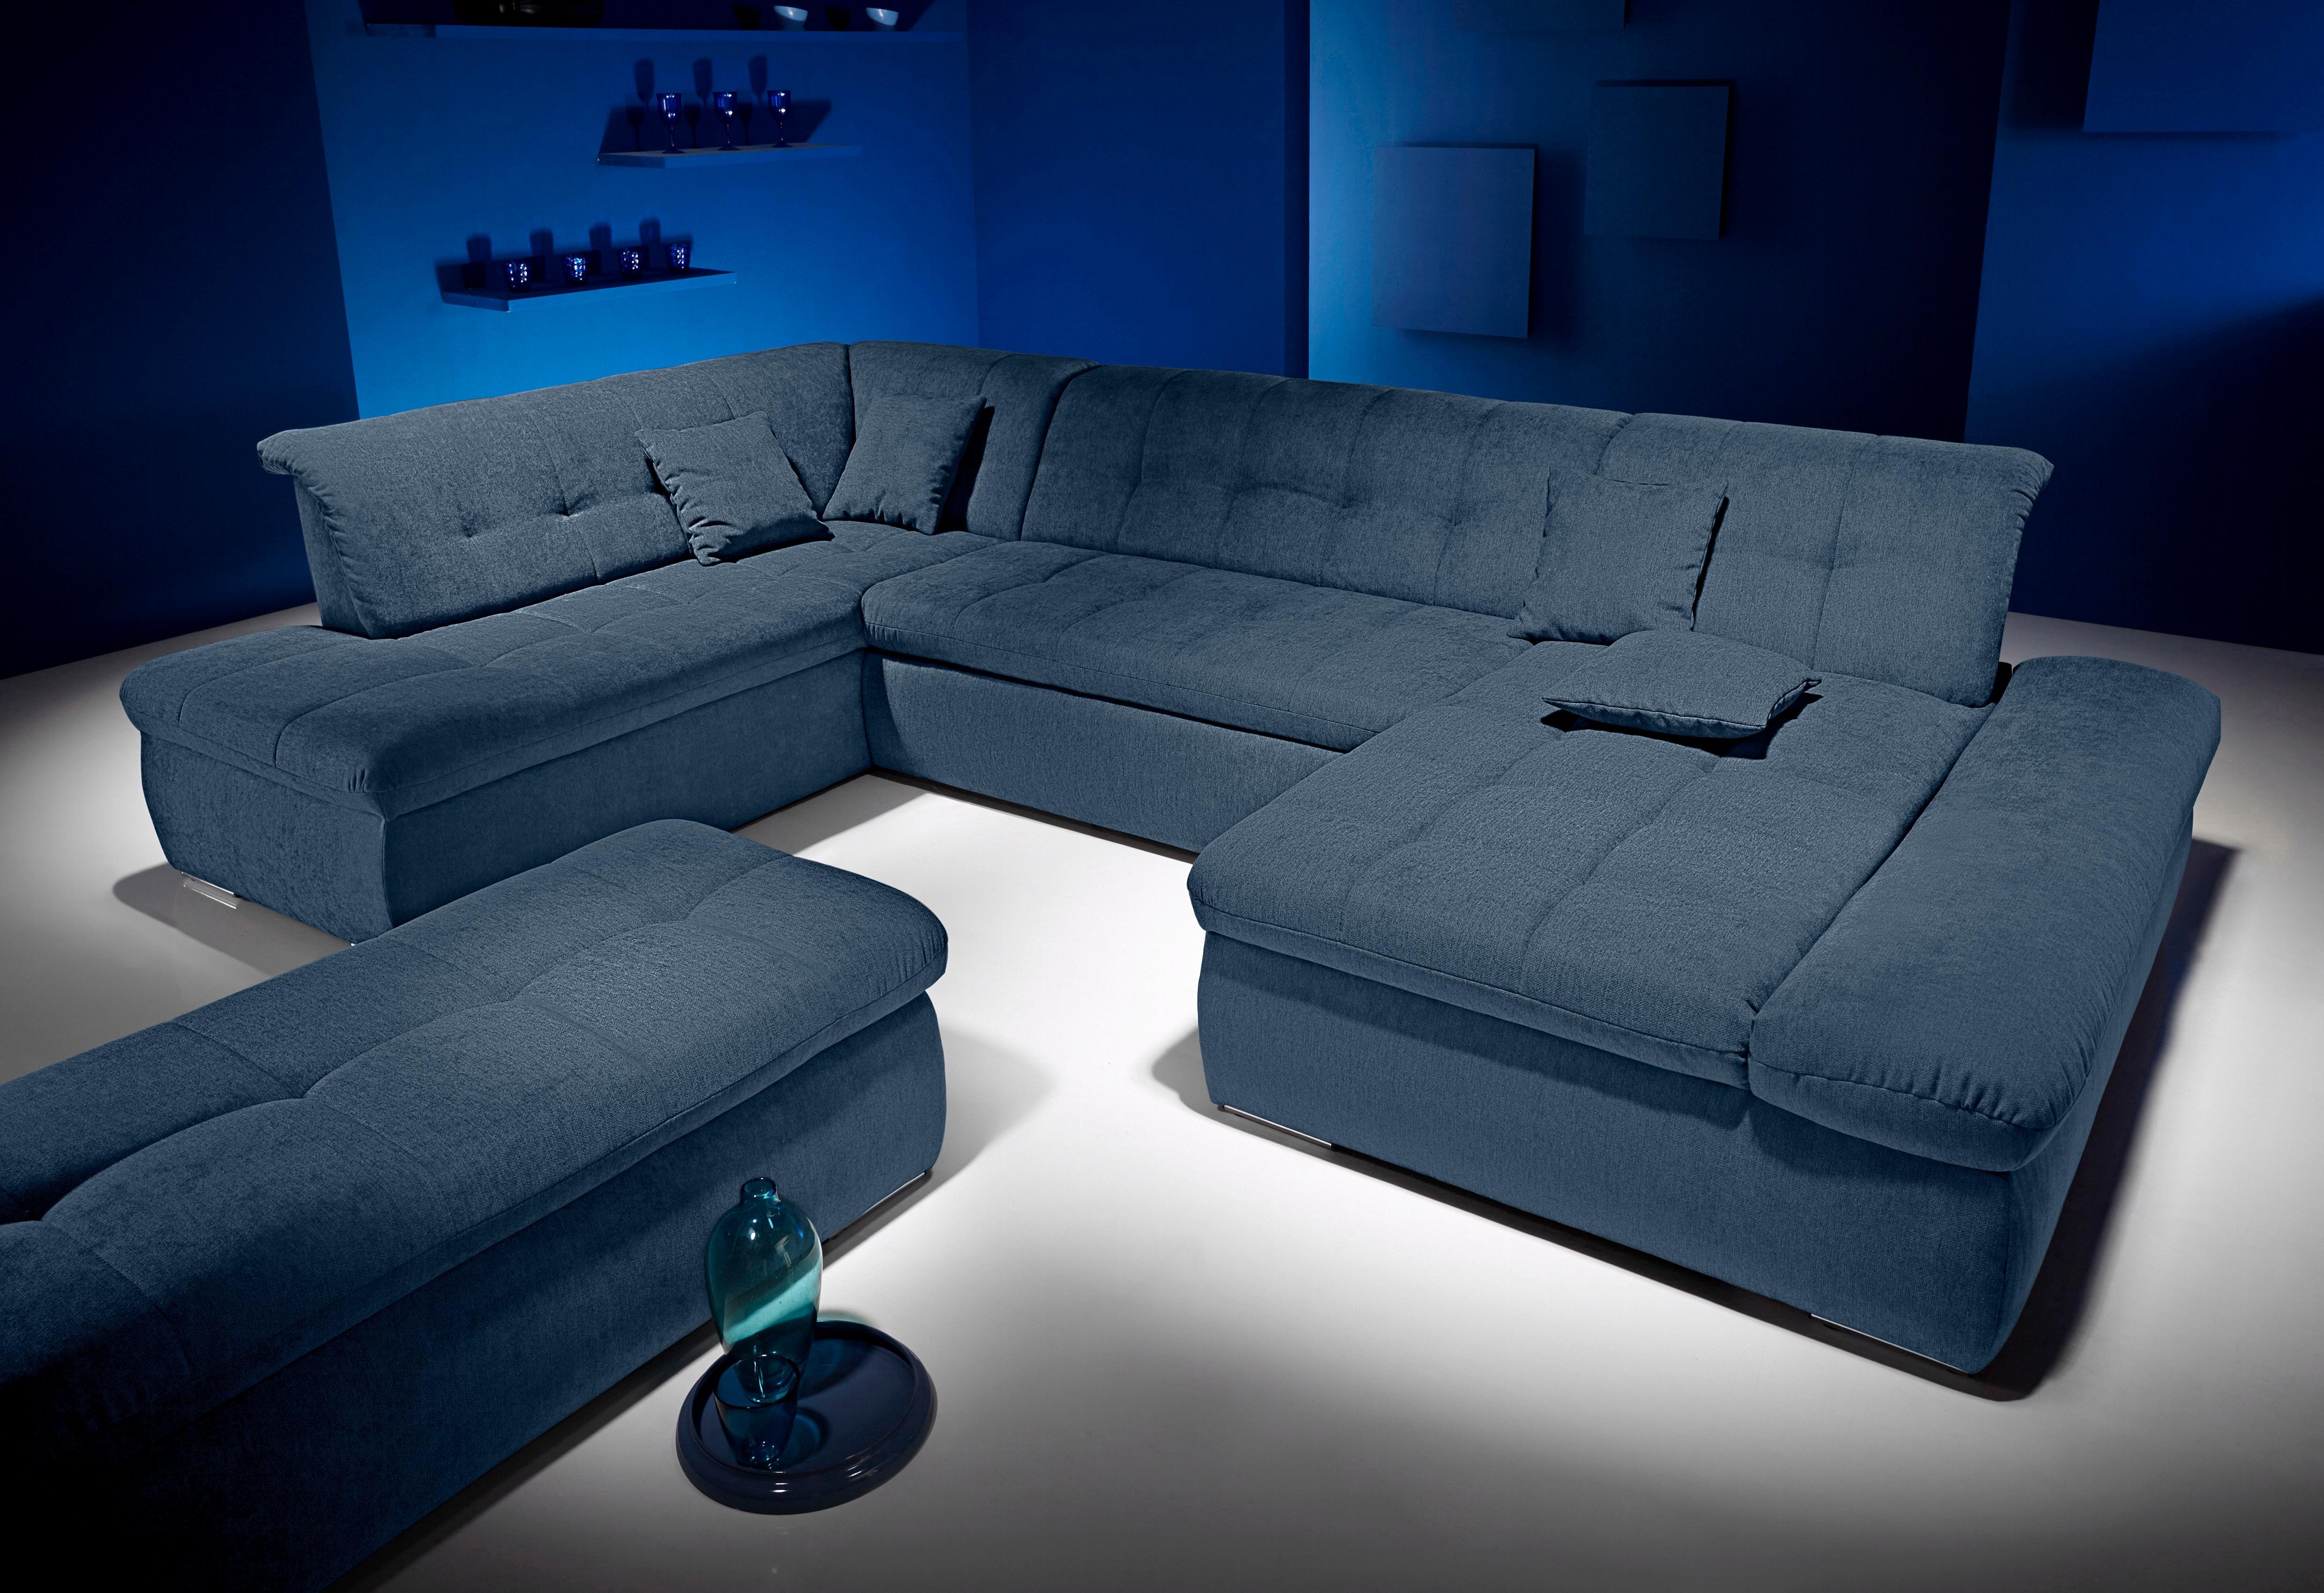 inosign wohnlandschaft billiger bei. Black Bedroom Furniture Sets. Home Design Ideas